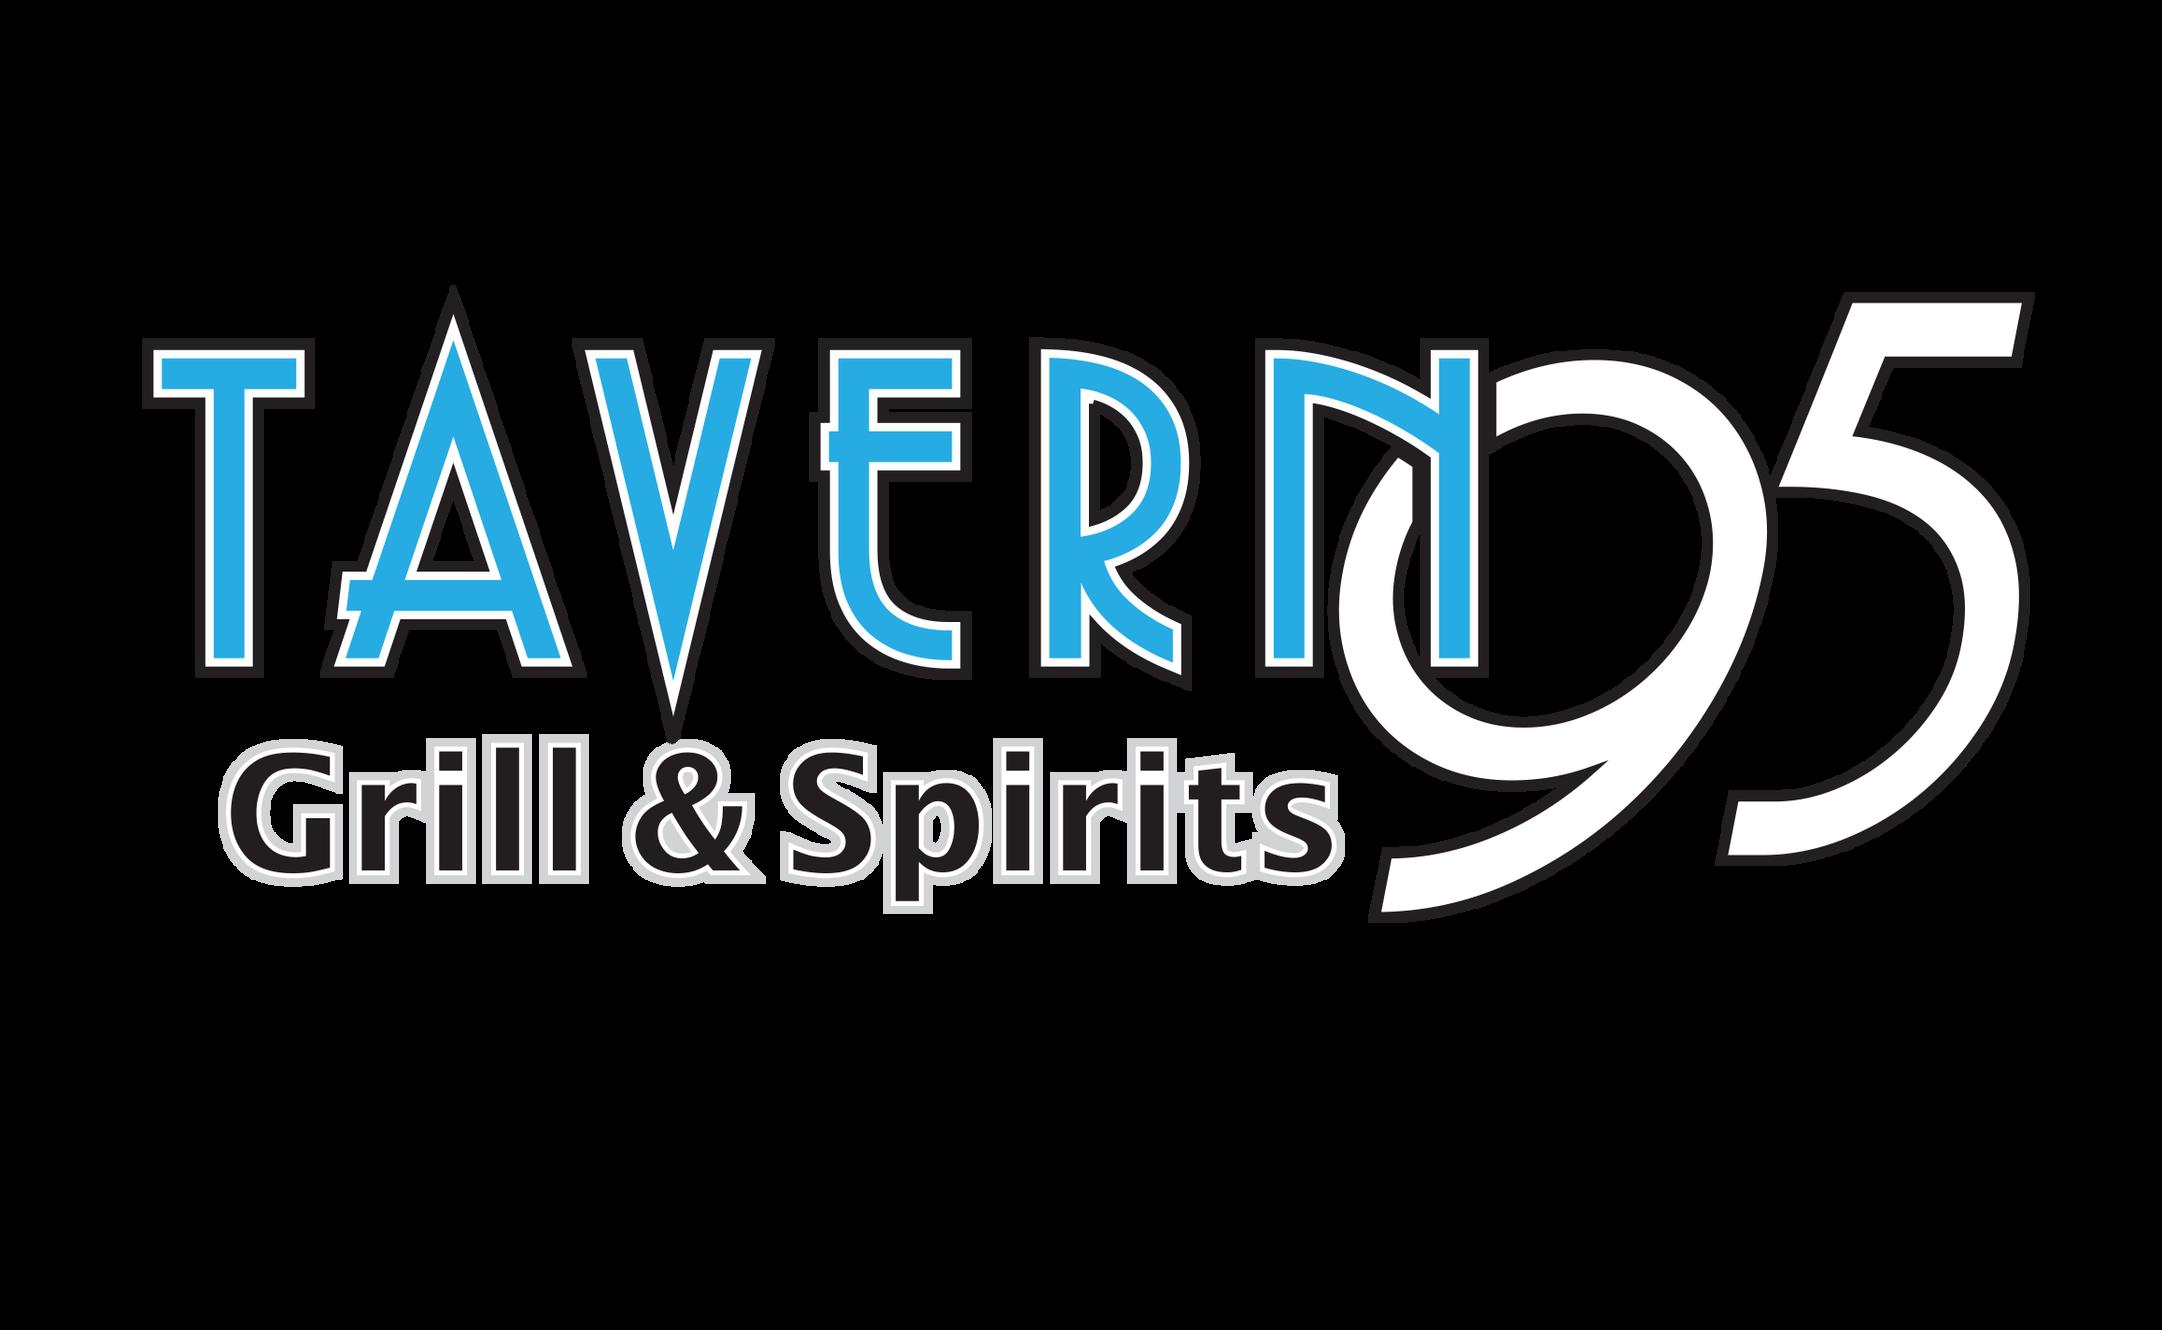 Tavern 95 Grill & Spirits logo